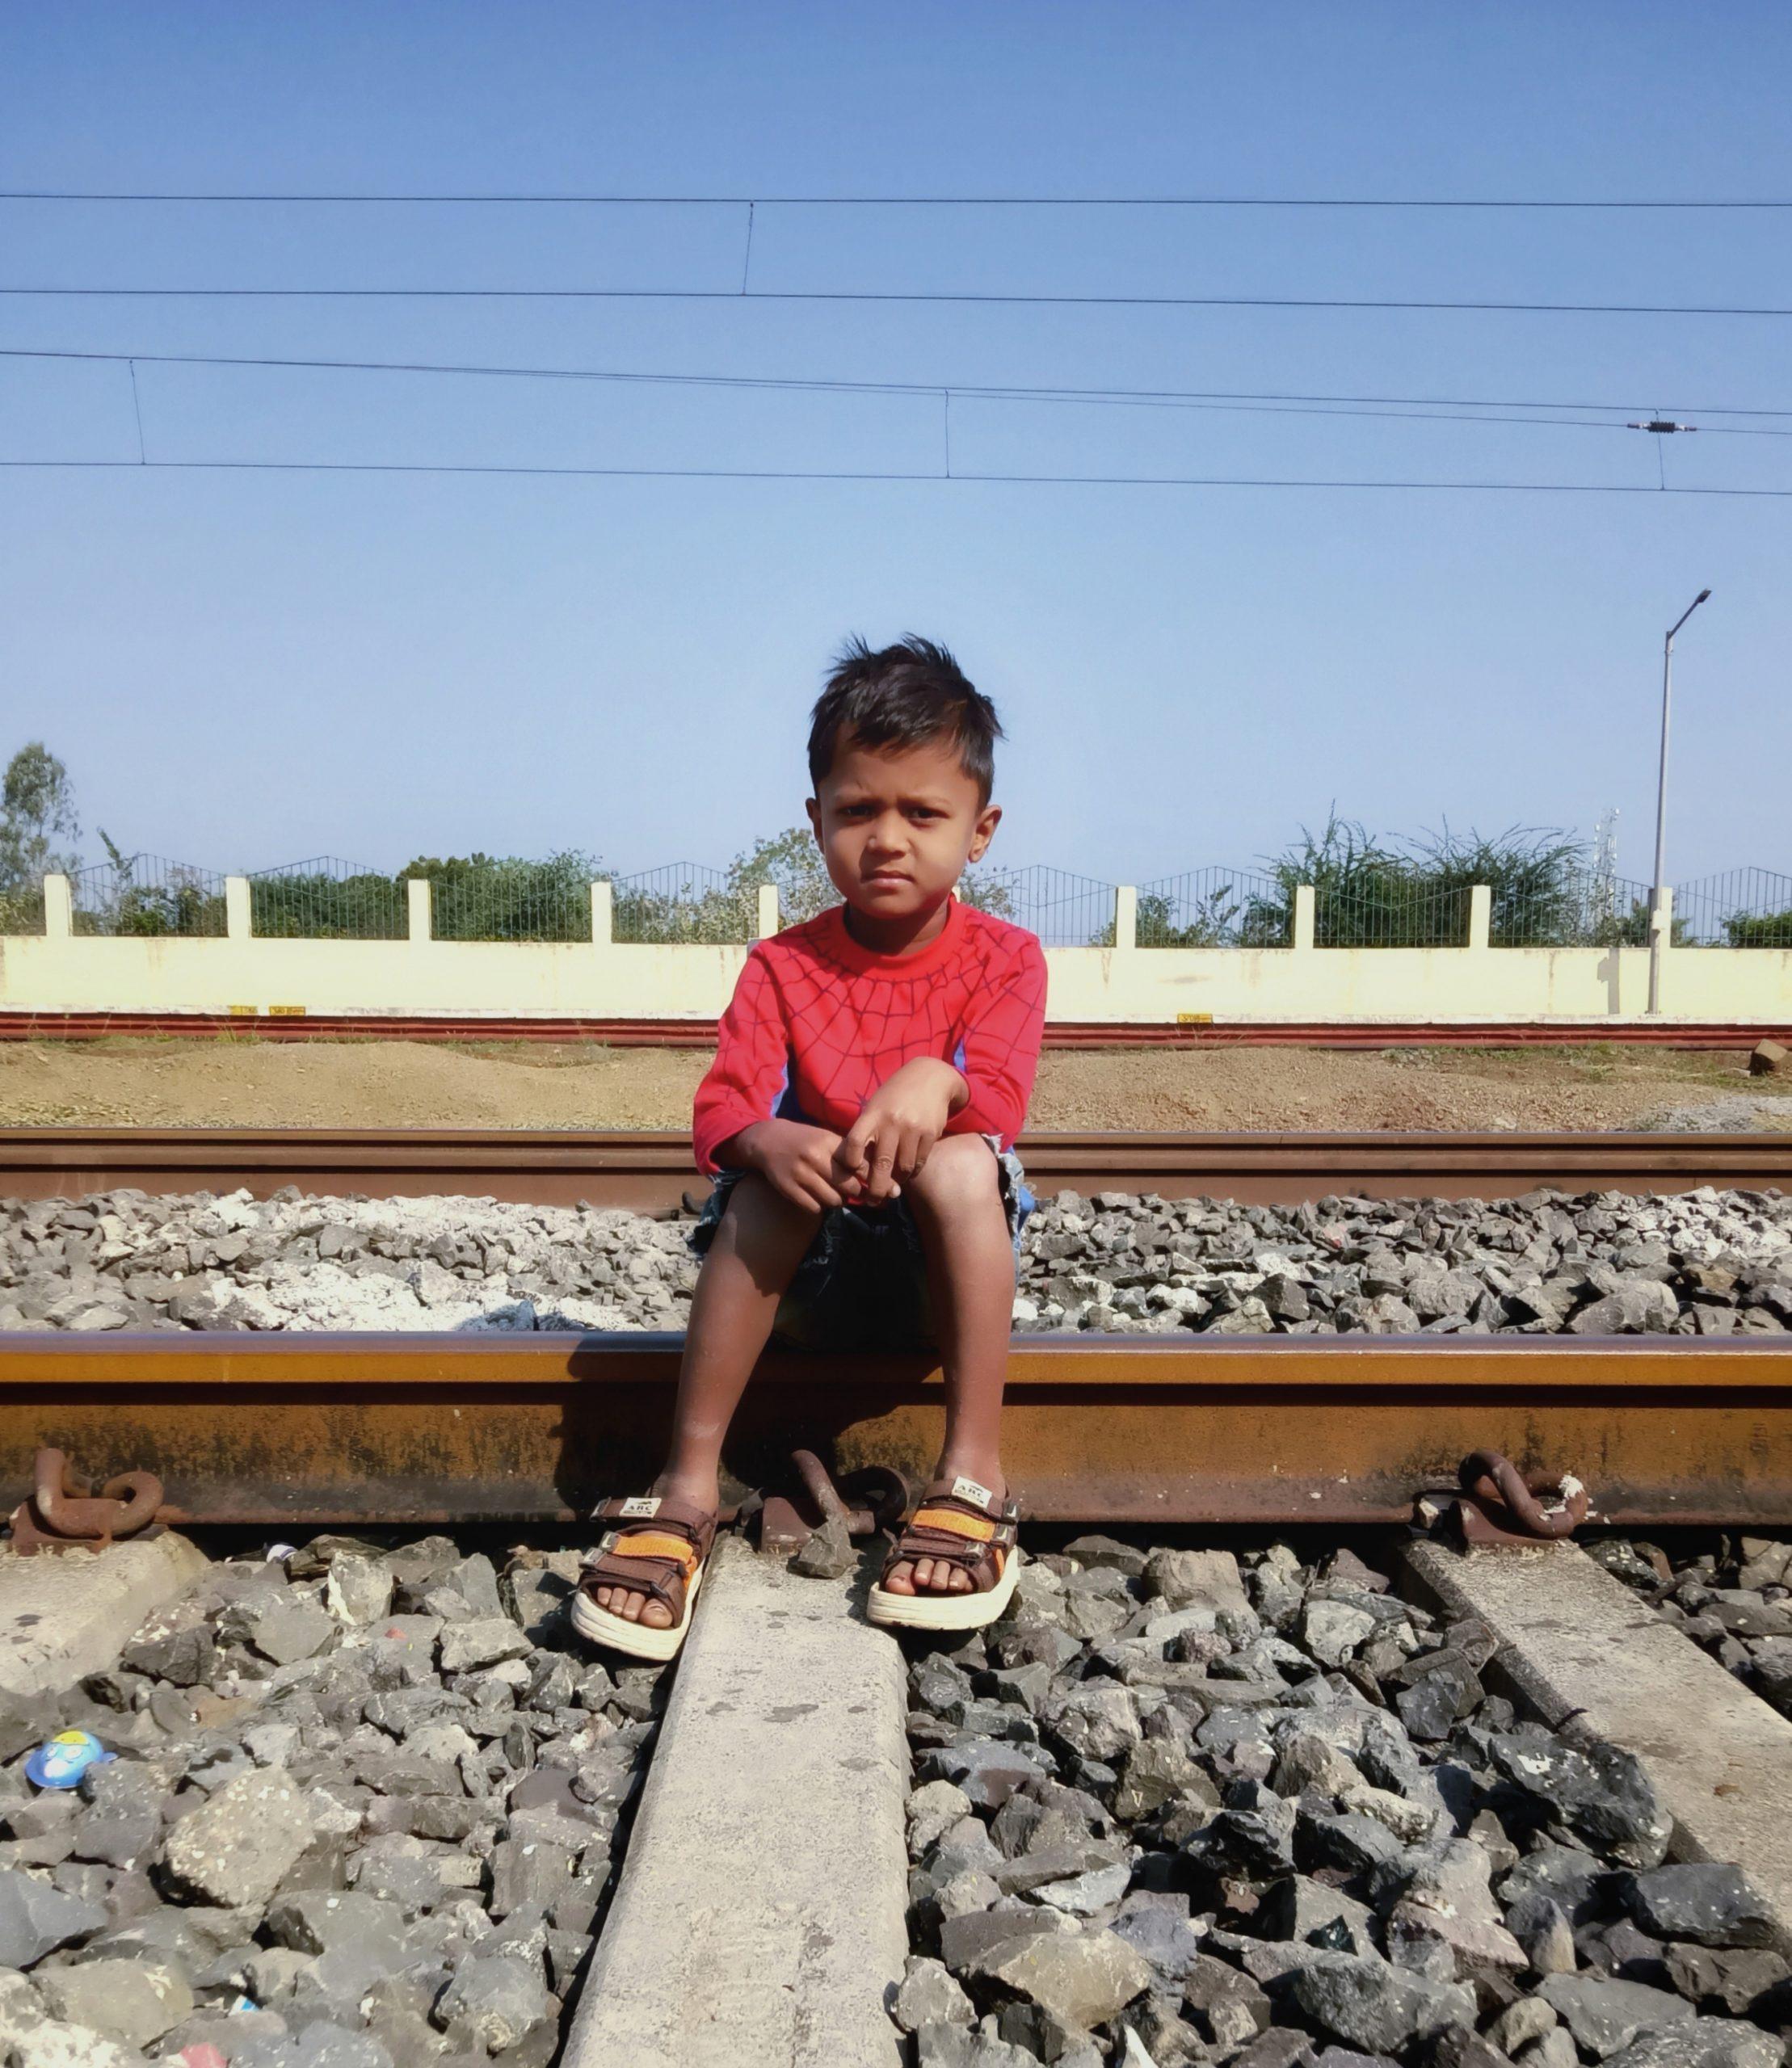 A kid sitting on railway track